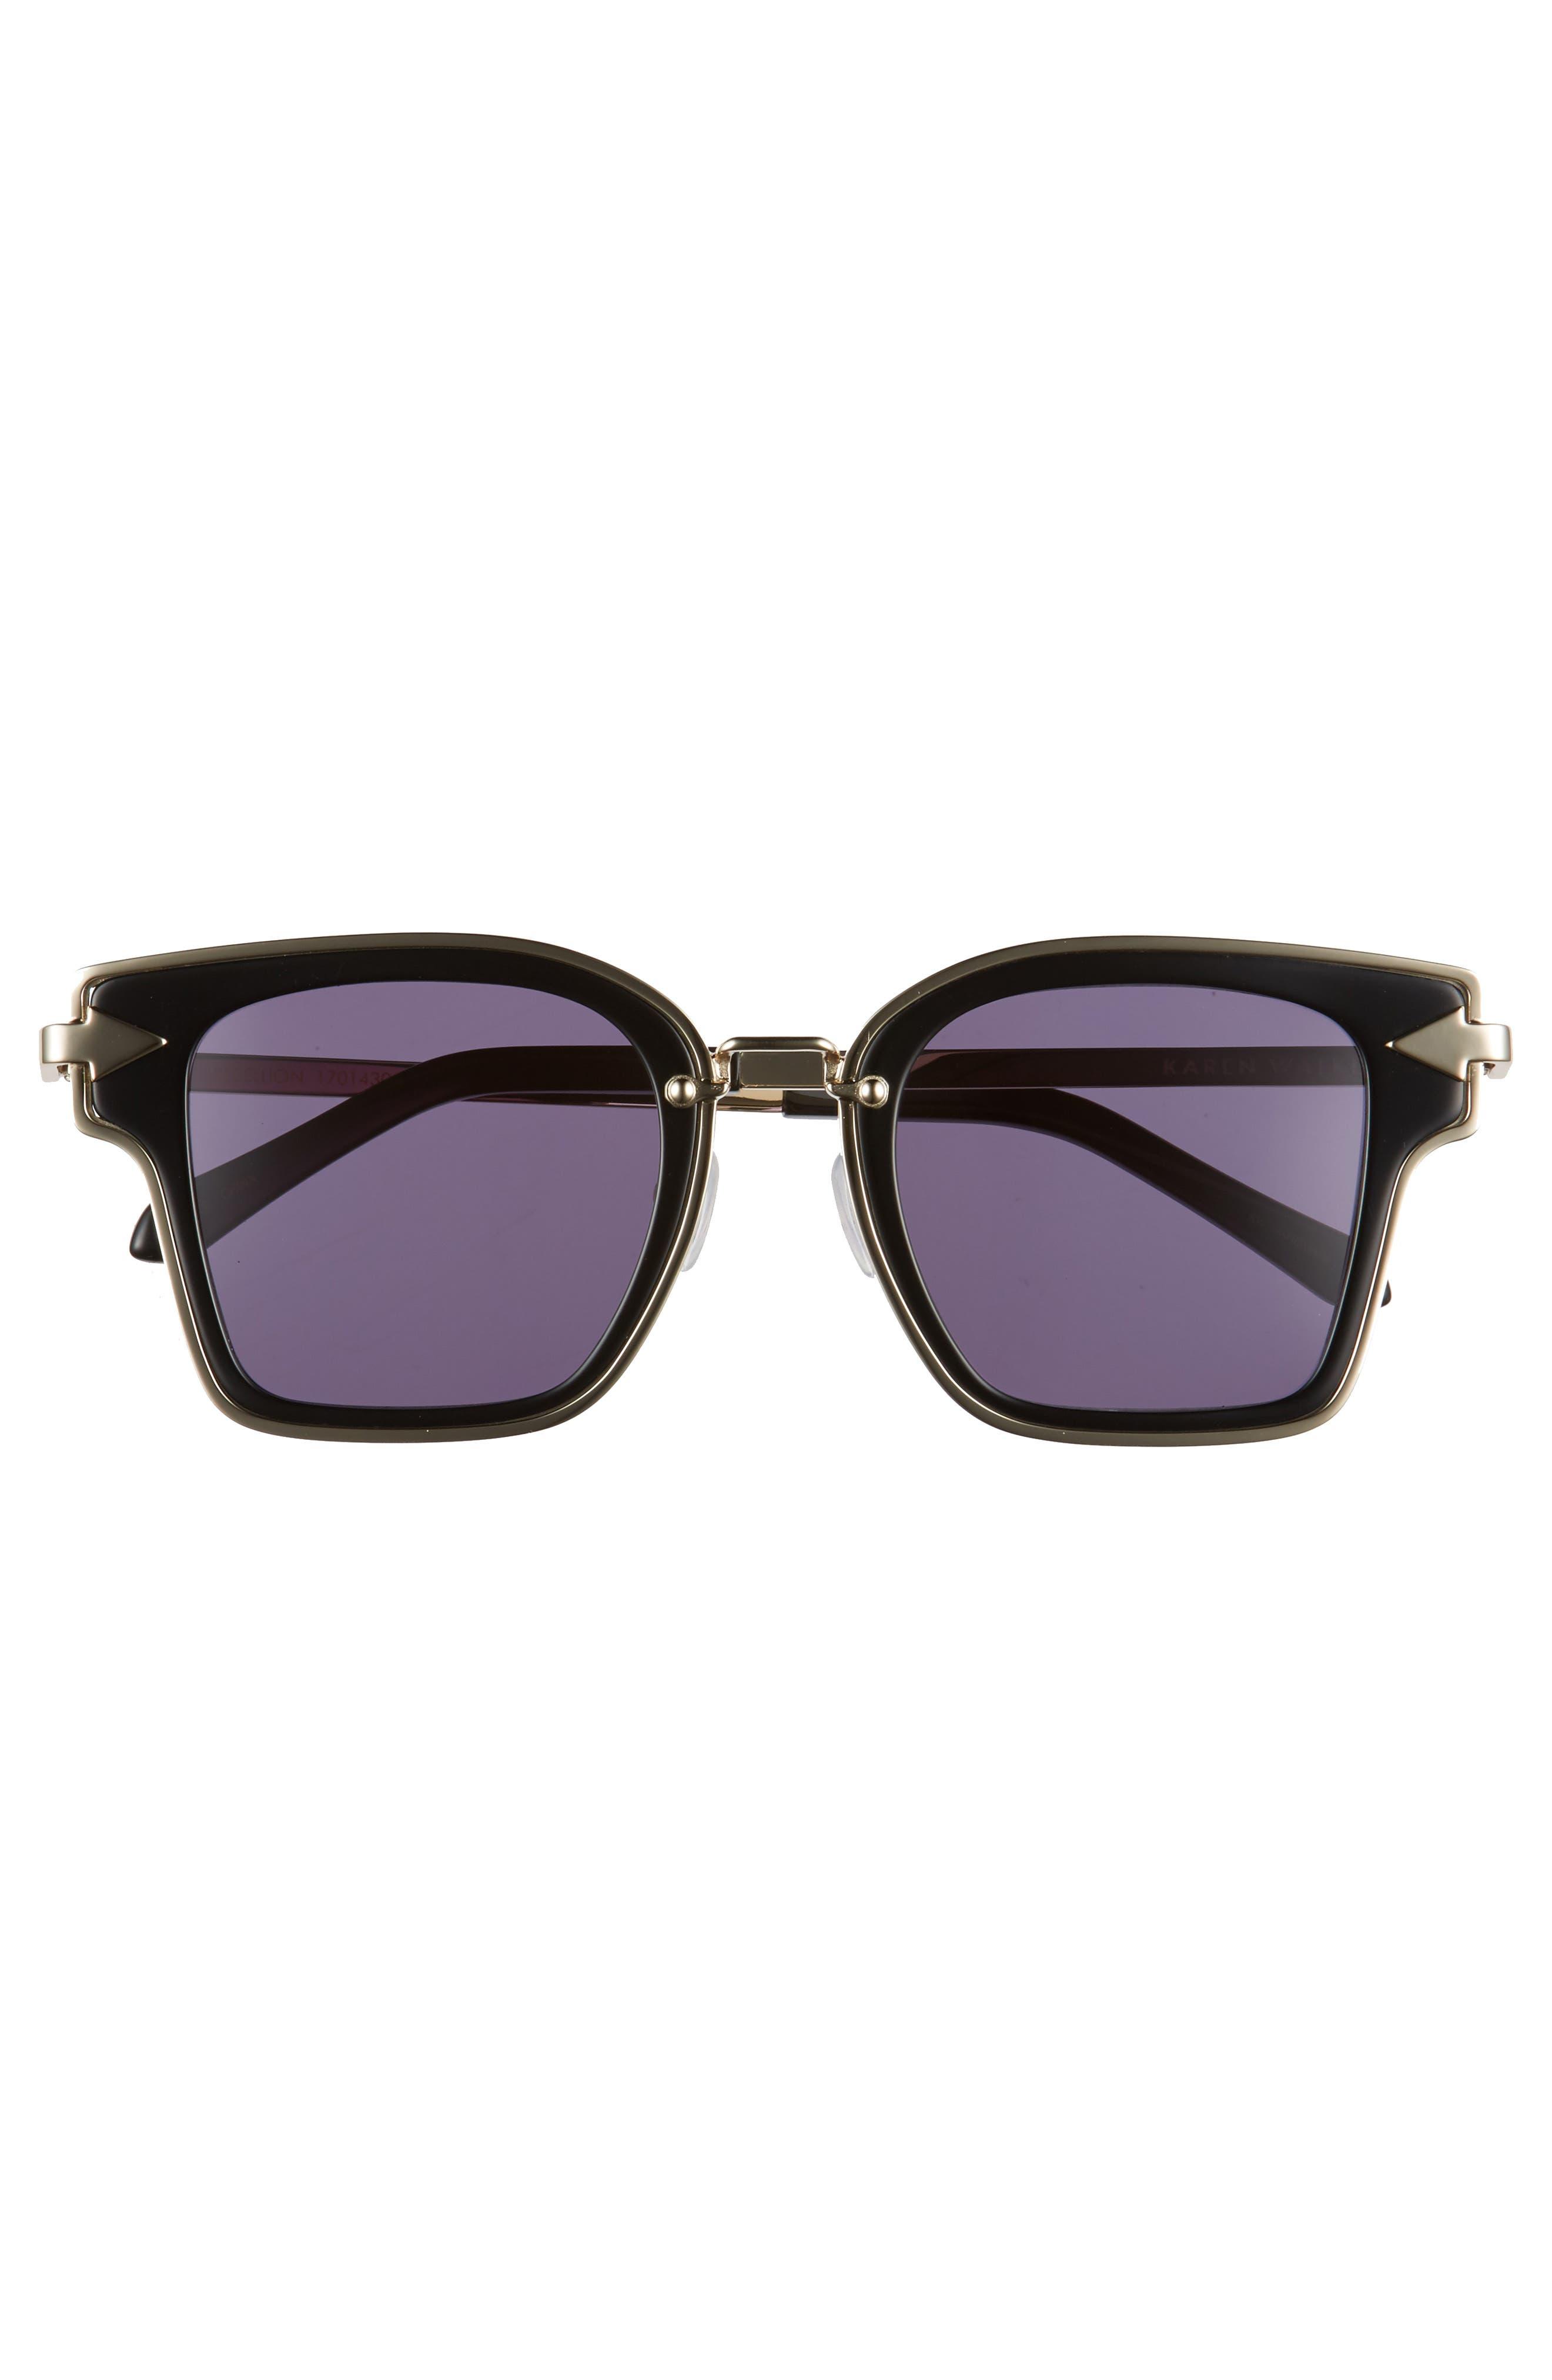 Rebellion 49mm Sunglasses,                             Alternate thumbnail 3, color,                             001